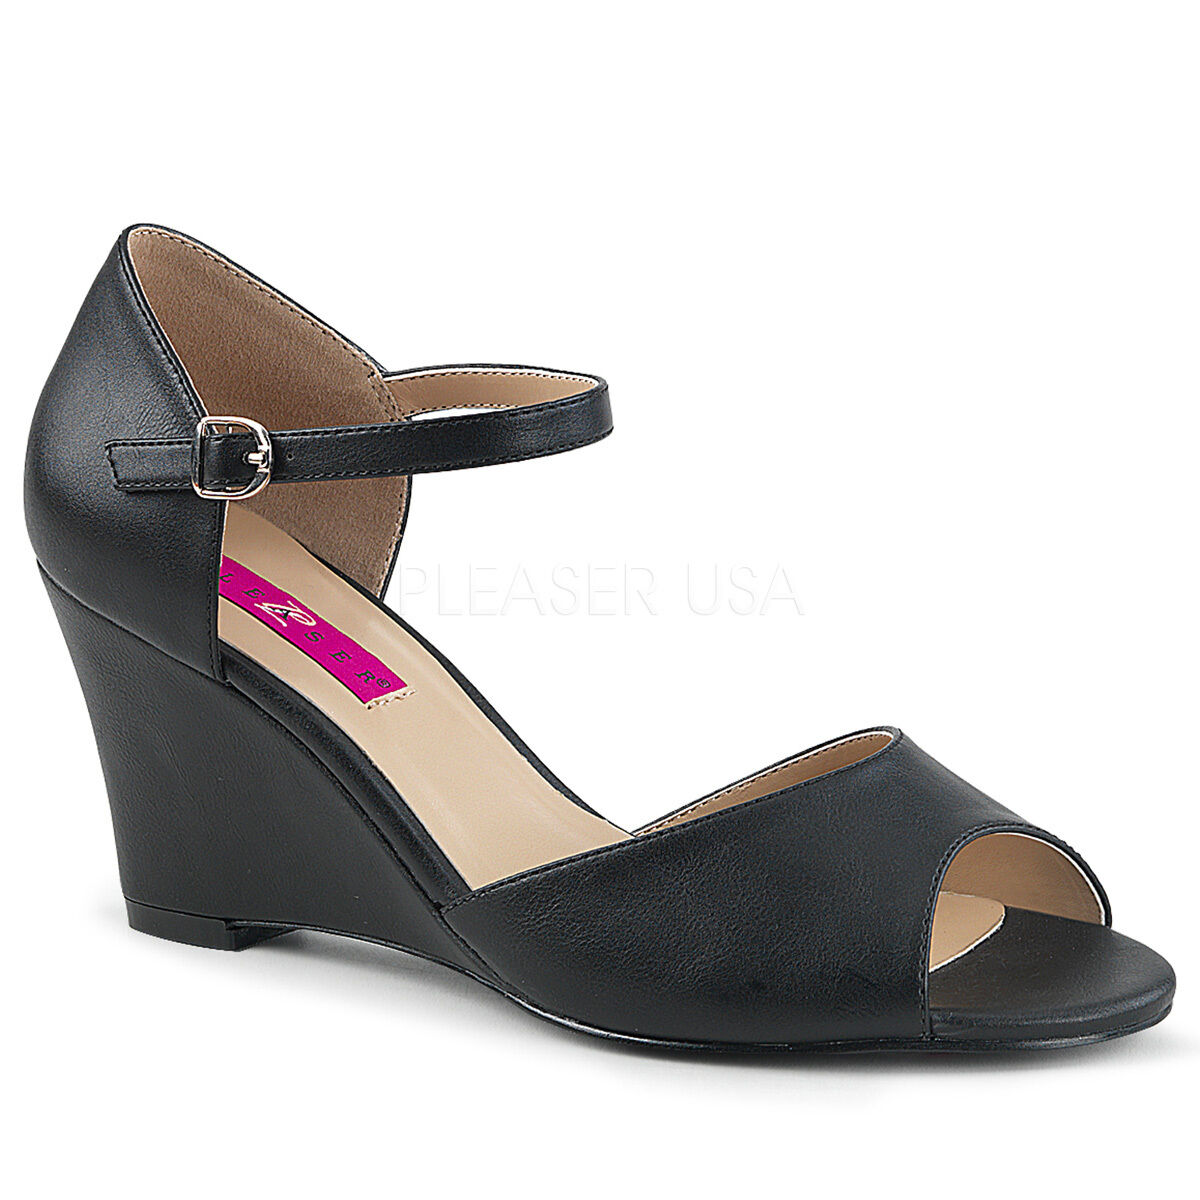 PLEASER Sexy 3  Wedge High Heels Black Faux Leather Sandals shoes KIM05 BPU